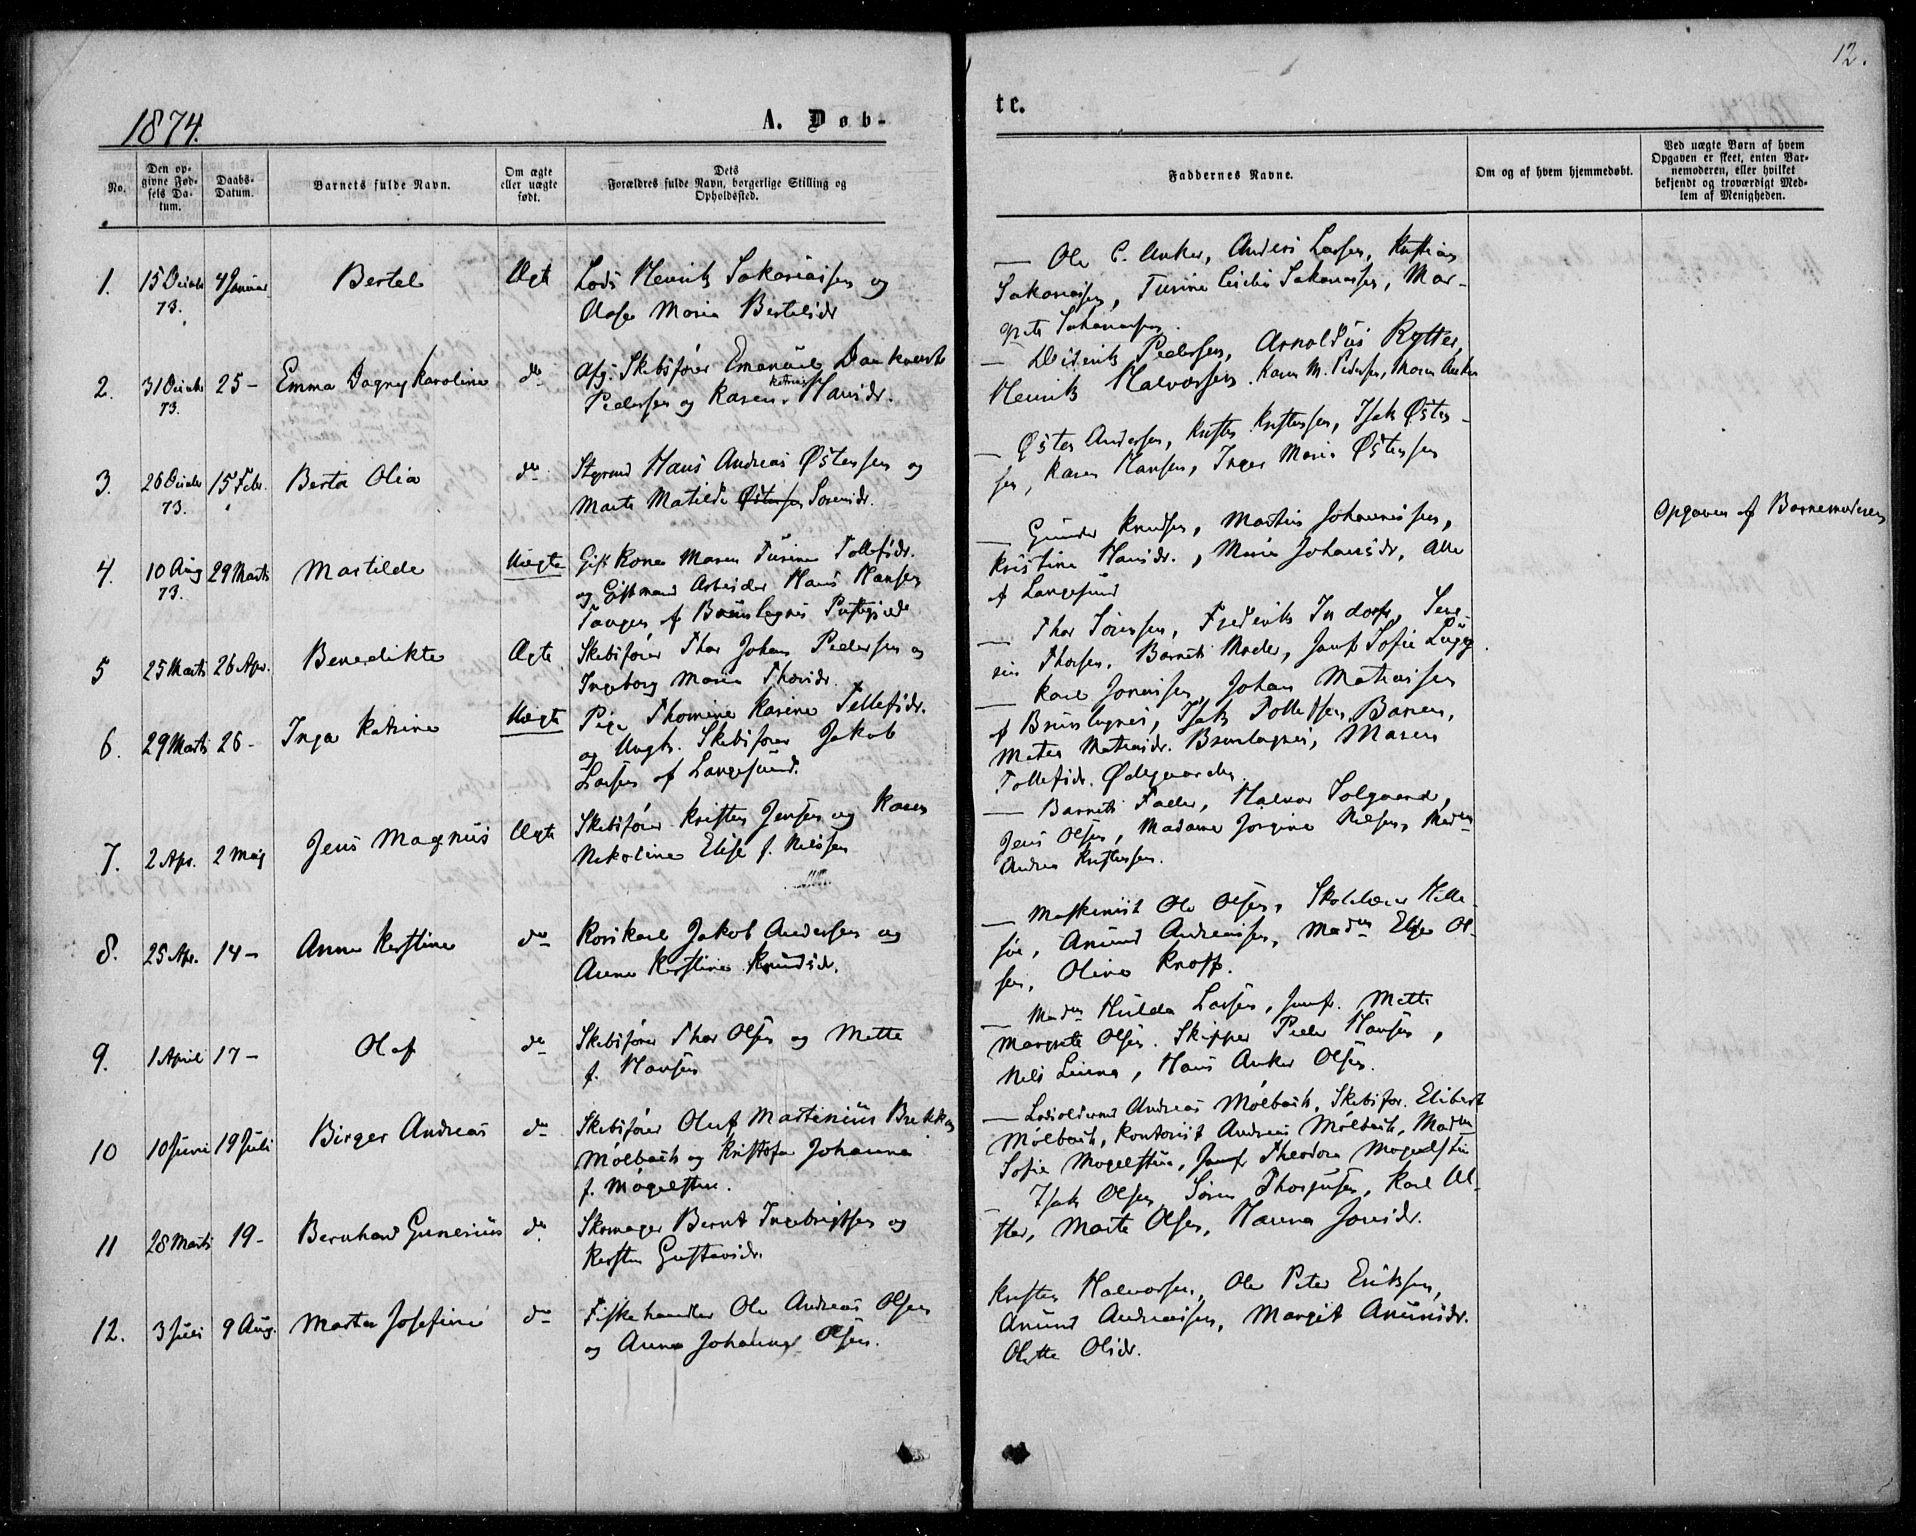 SAKO, Langesund kirkebøker, F/Fa/L0001: Ministerialbok nr. 1, 1870-1877, s. 12